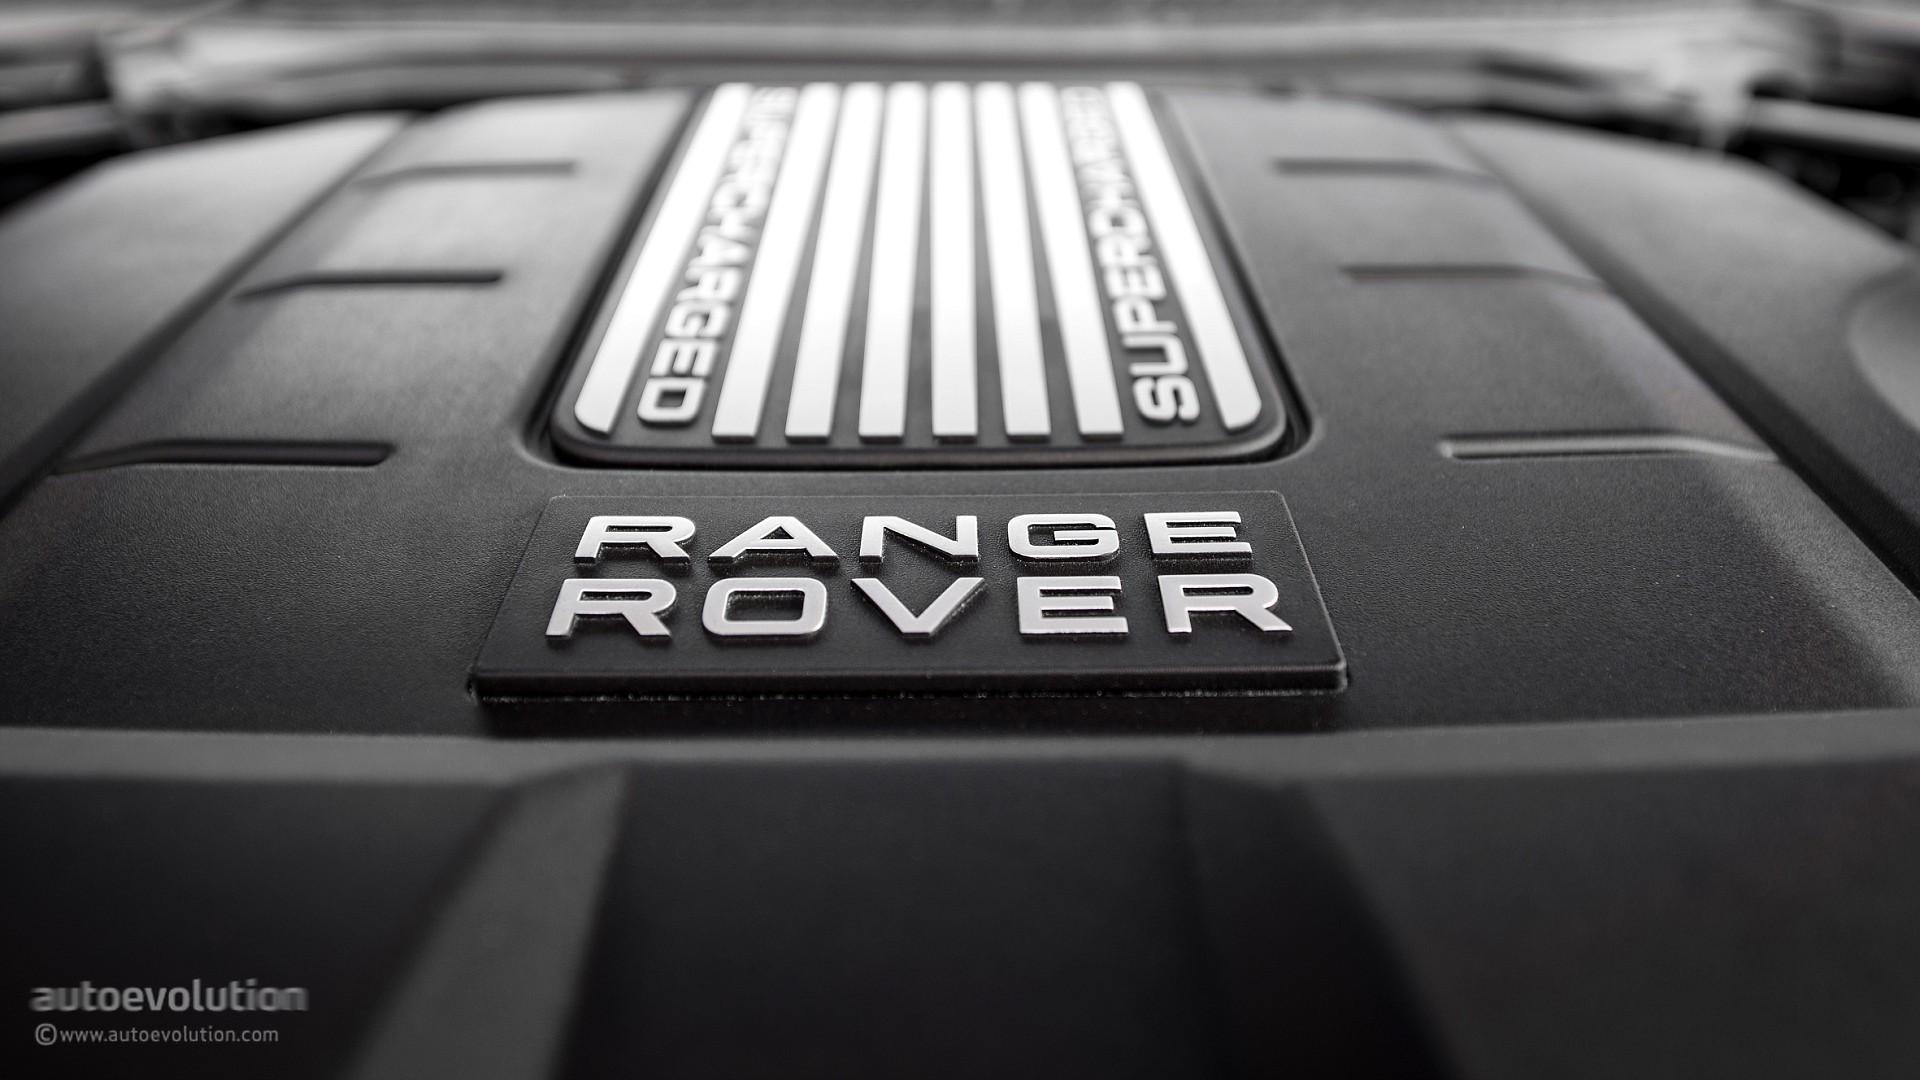 Download Logo Range Rover Hd: Range Rover Sport Supercharged In Dubai's Desert: HD